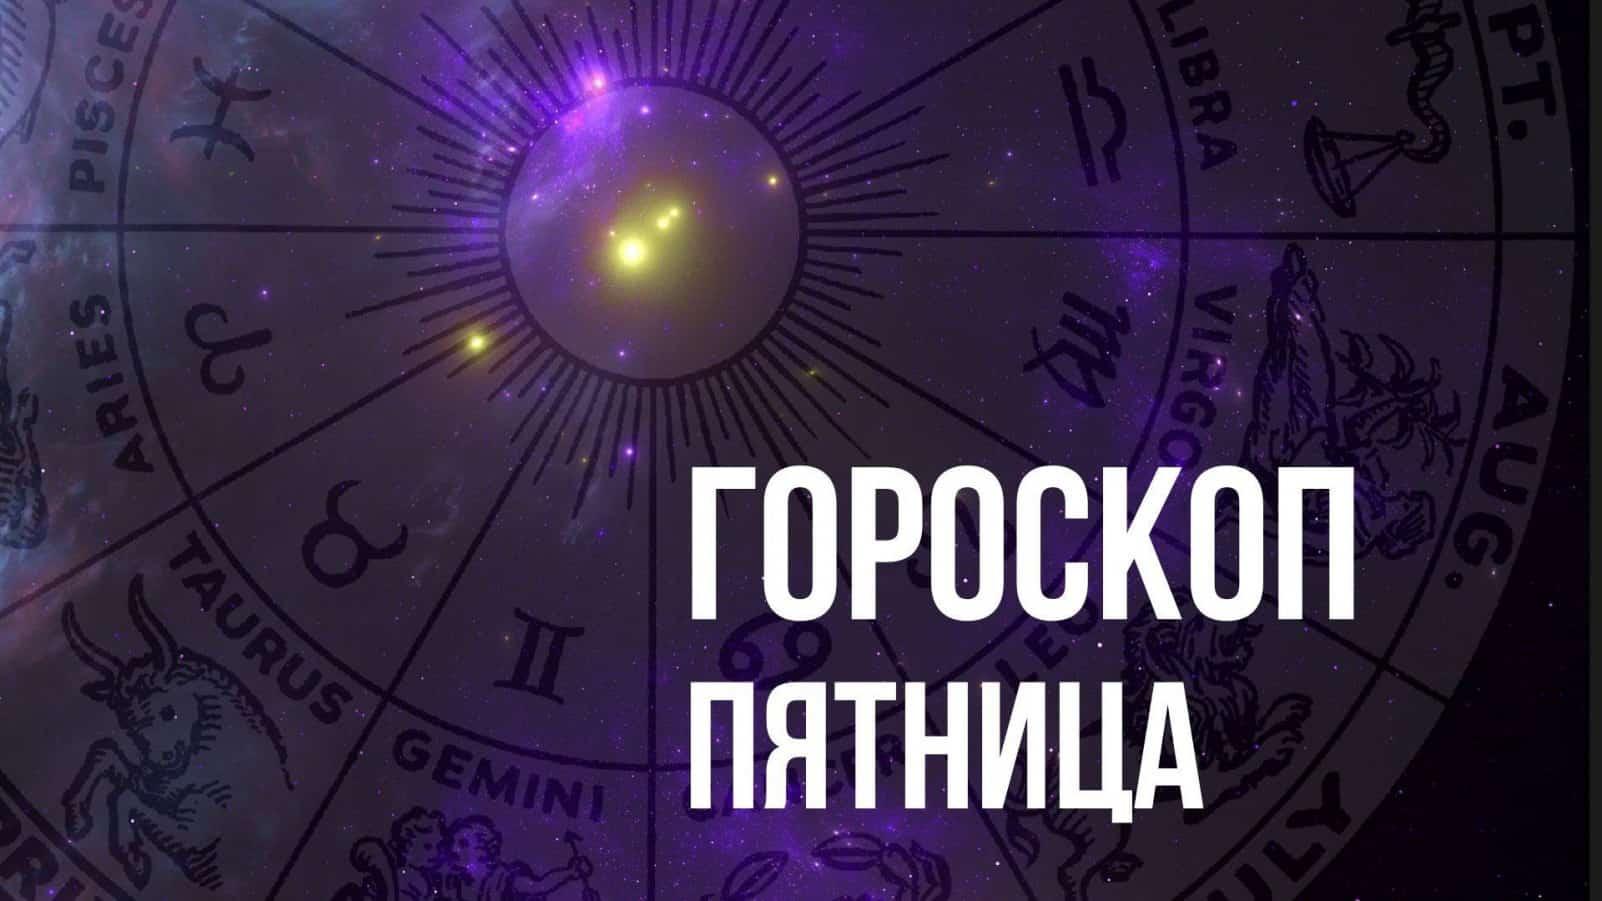 Гороскоп на пятницу 5 марта для каждого знака Зодиака